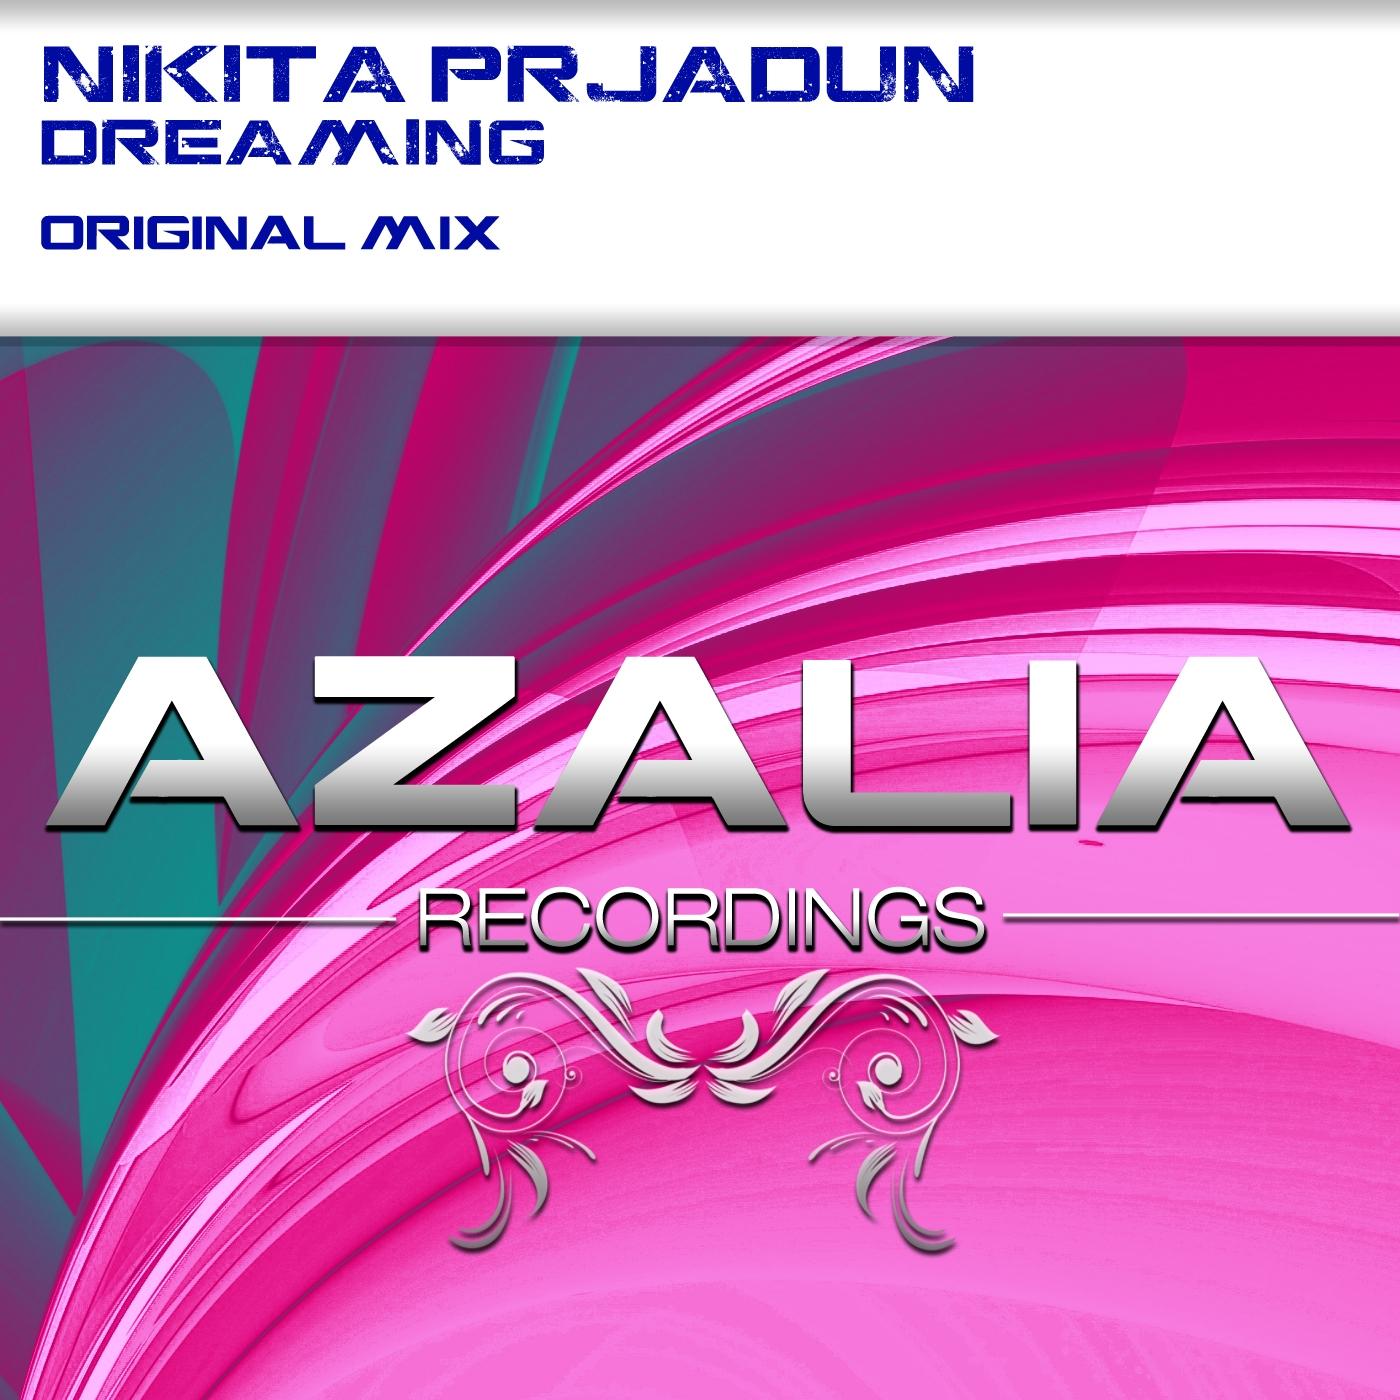 Nikita Prjadun - Dreaming (Original Mix)